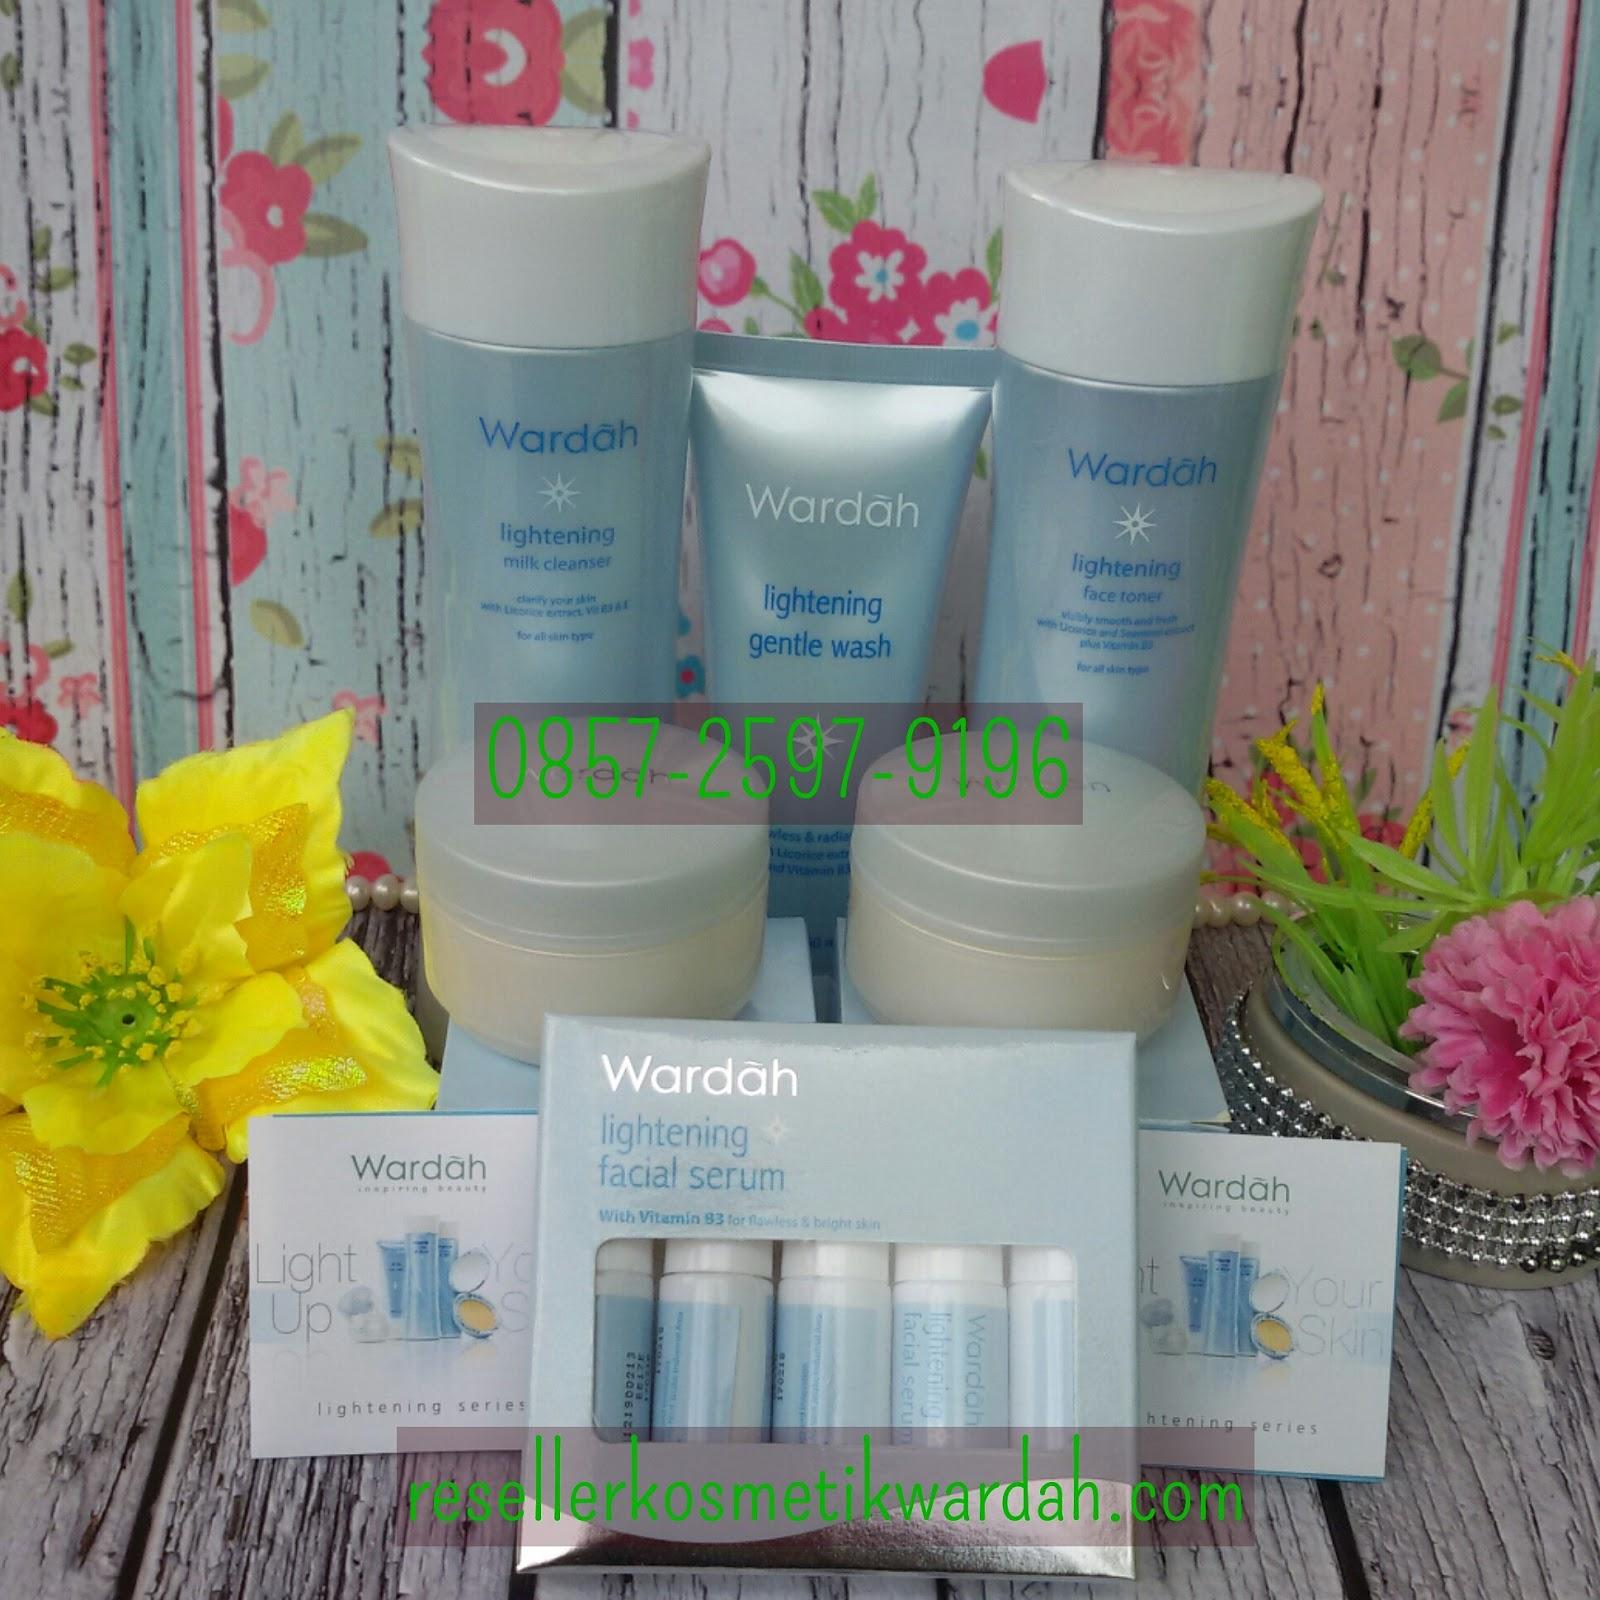 Beauty Onliner March 2016 Wardah Lightening Face Toner 150 Ml Wash Scrub Day 20 Lightwning Night Serum 1